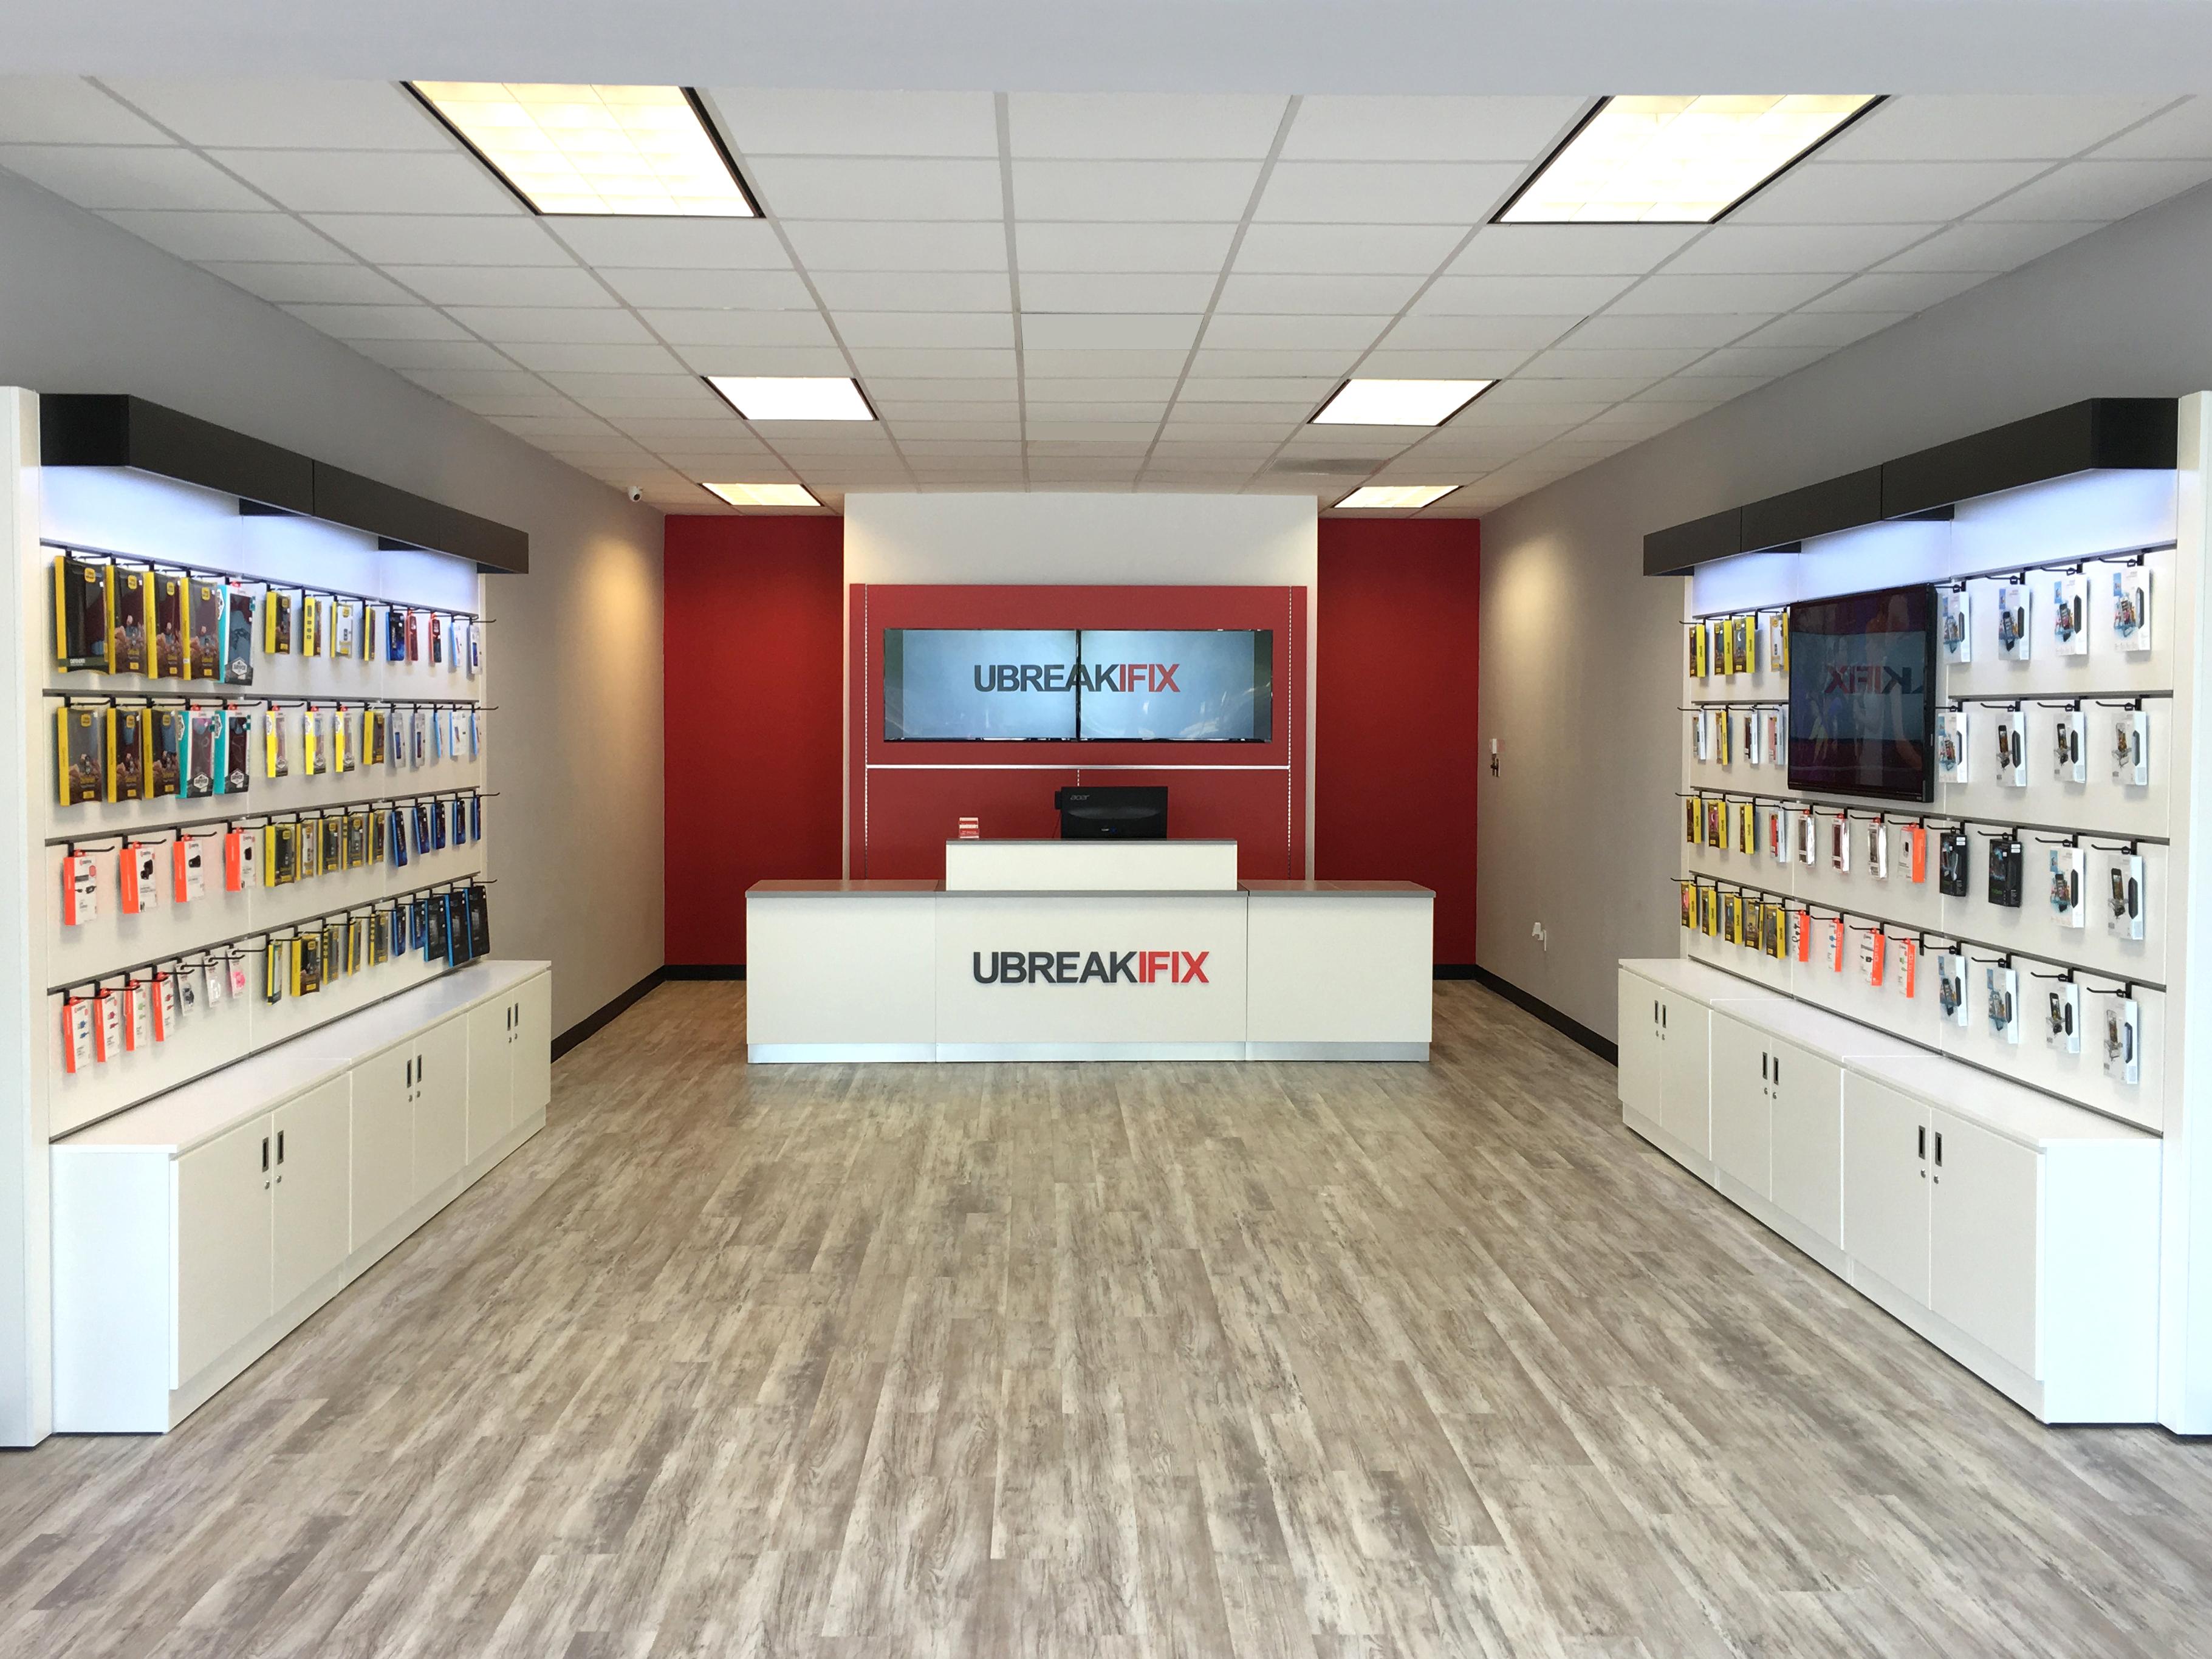 uBreakiFix Opens Milestone 275th Store in Metairie, Louisiana